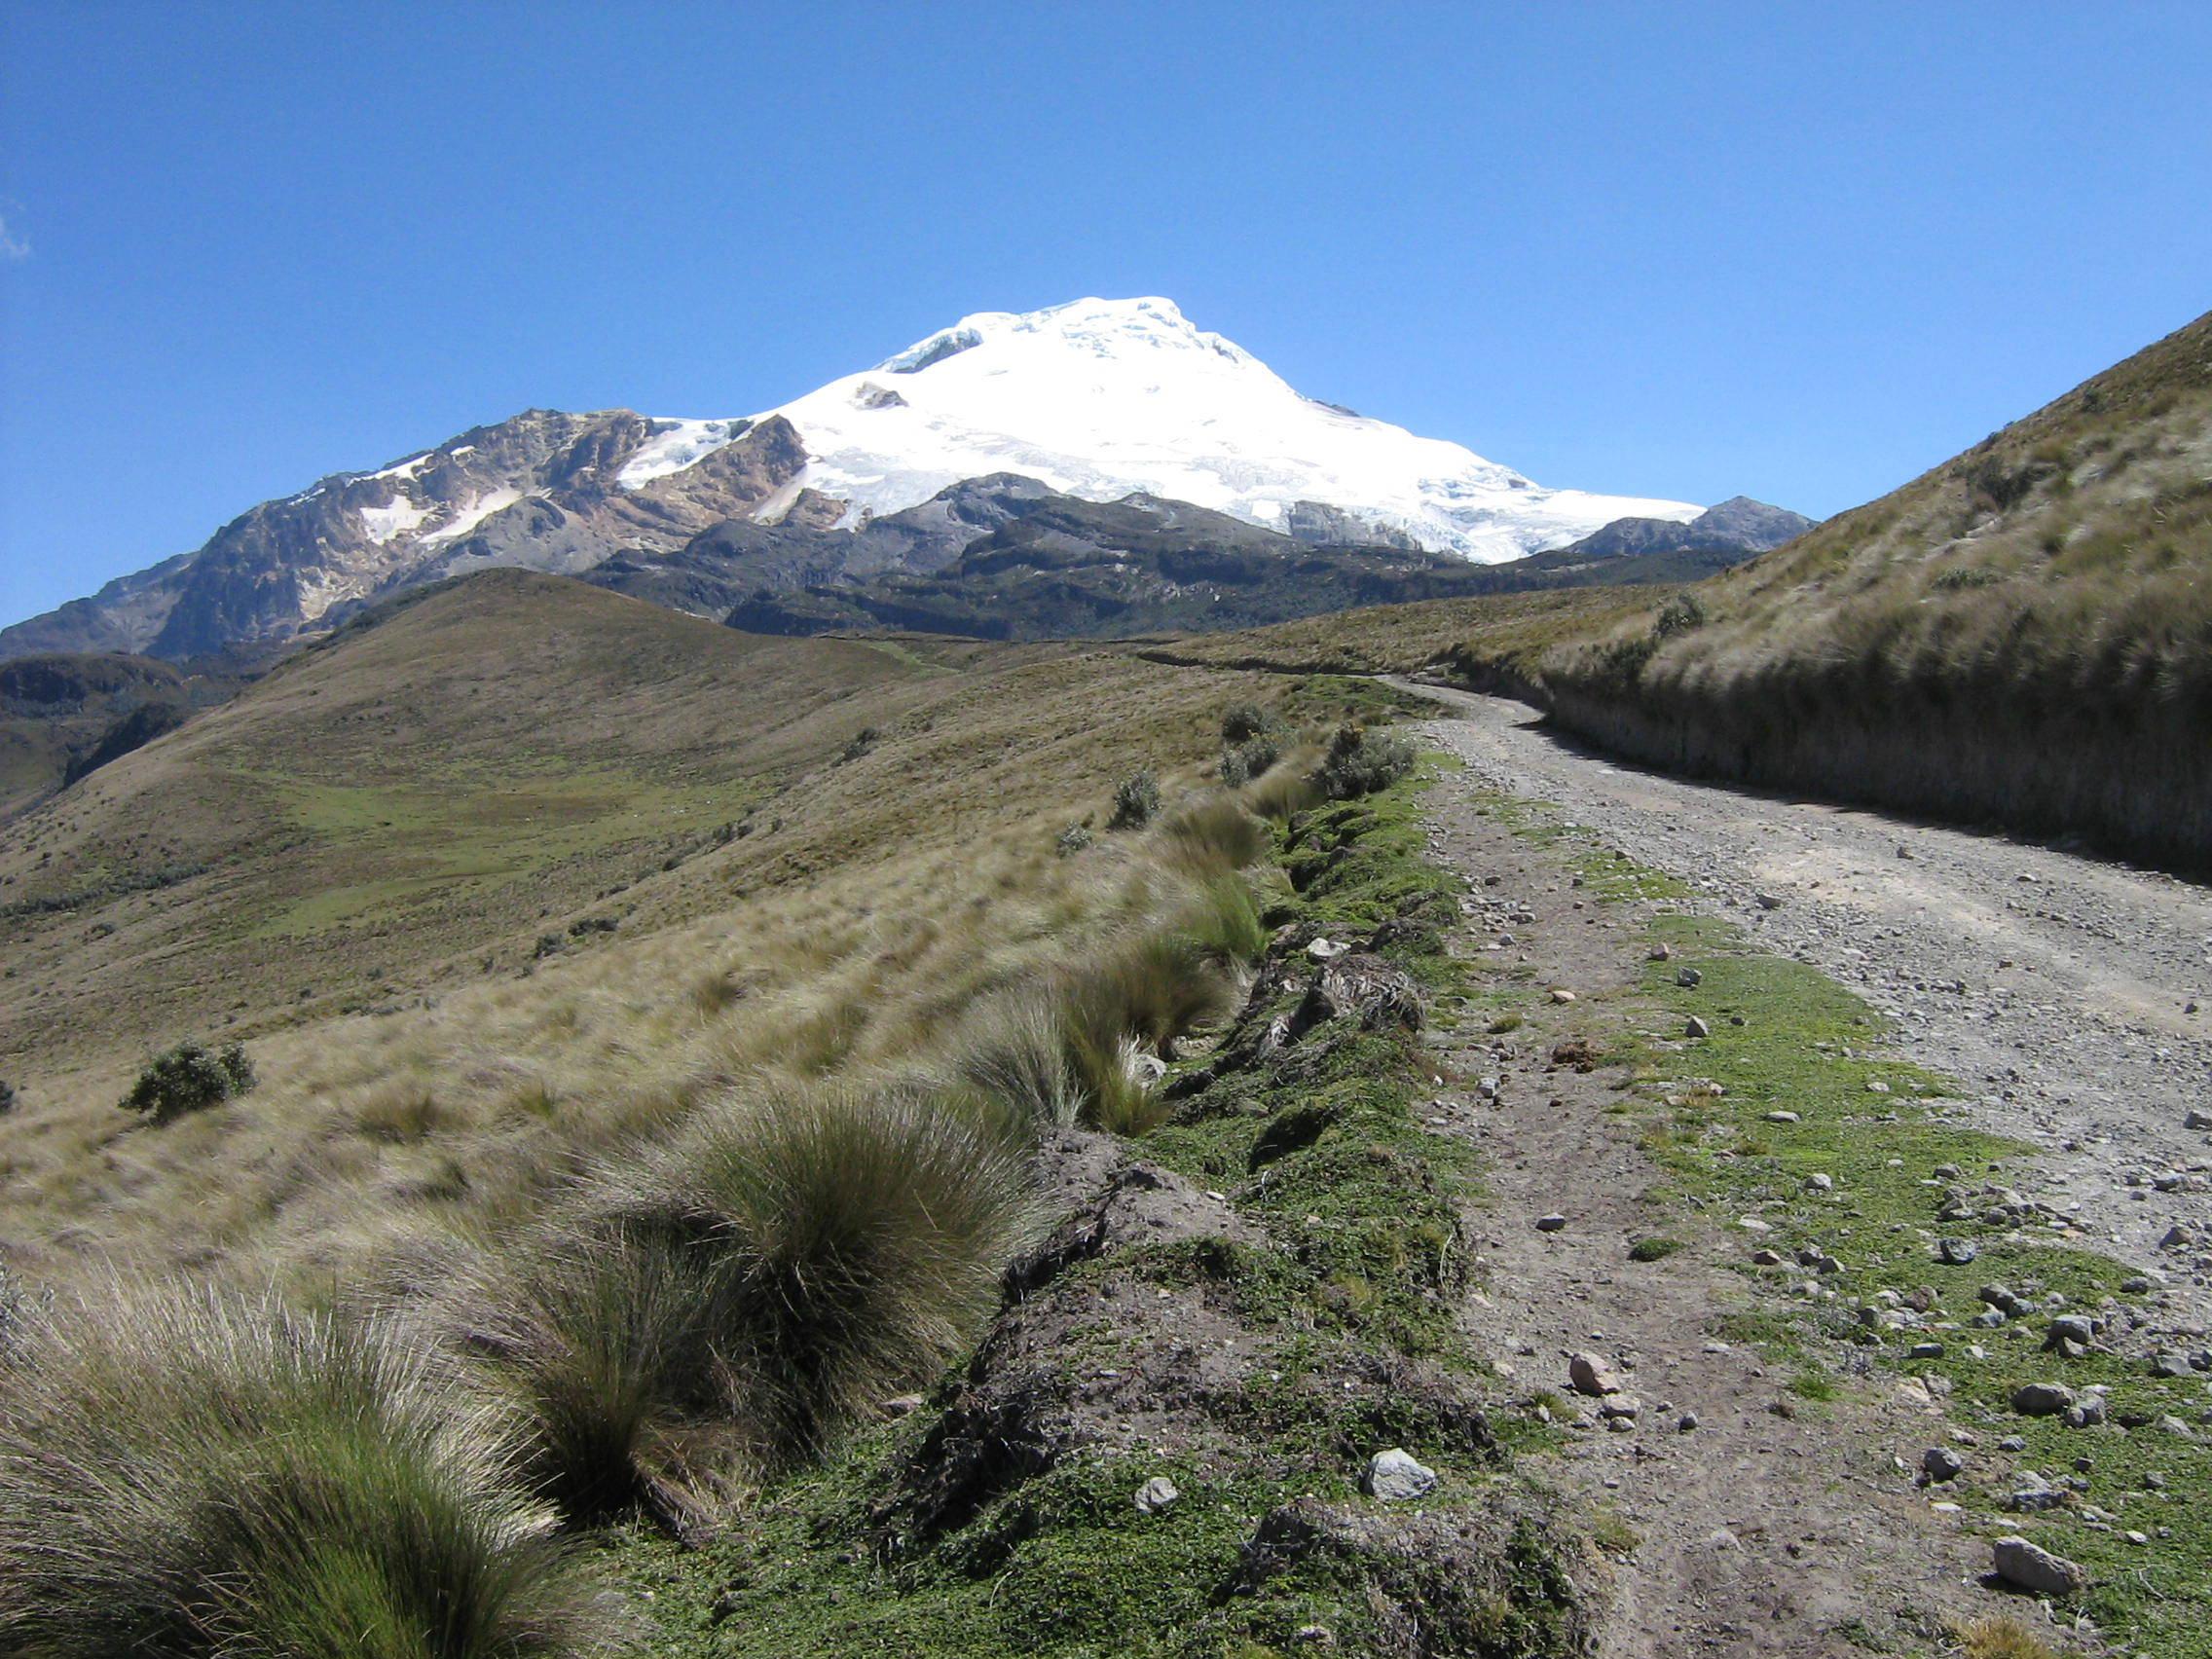 Straße/Weg zum Vulkan Cayambe und der dortigen Bergsteiger-Station